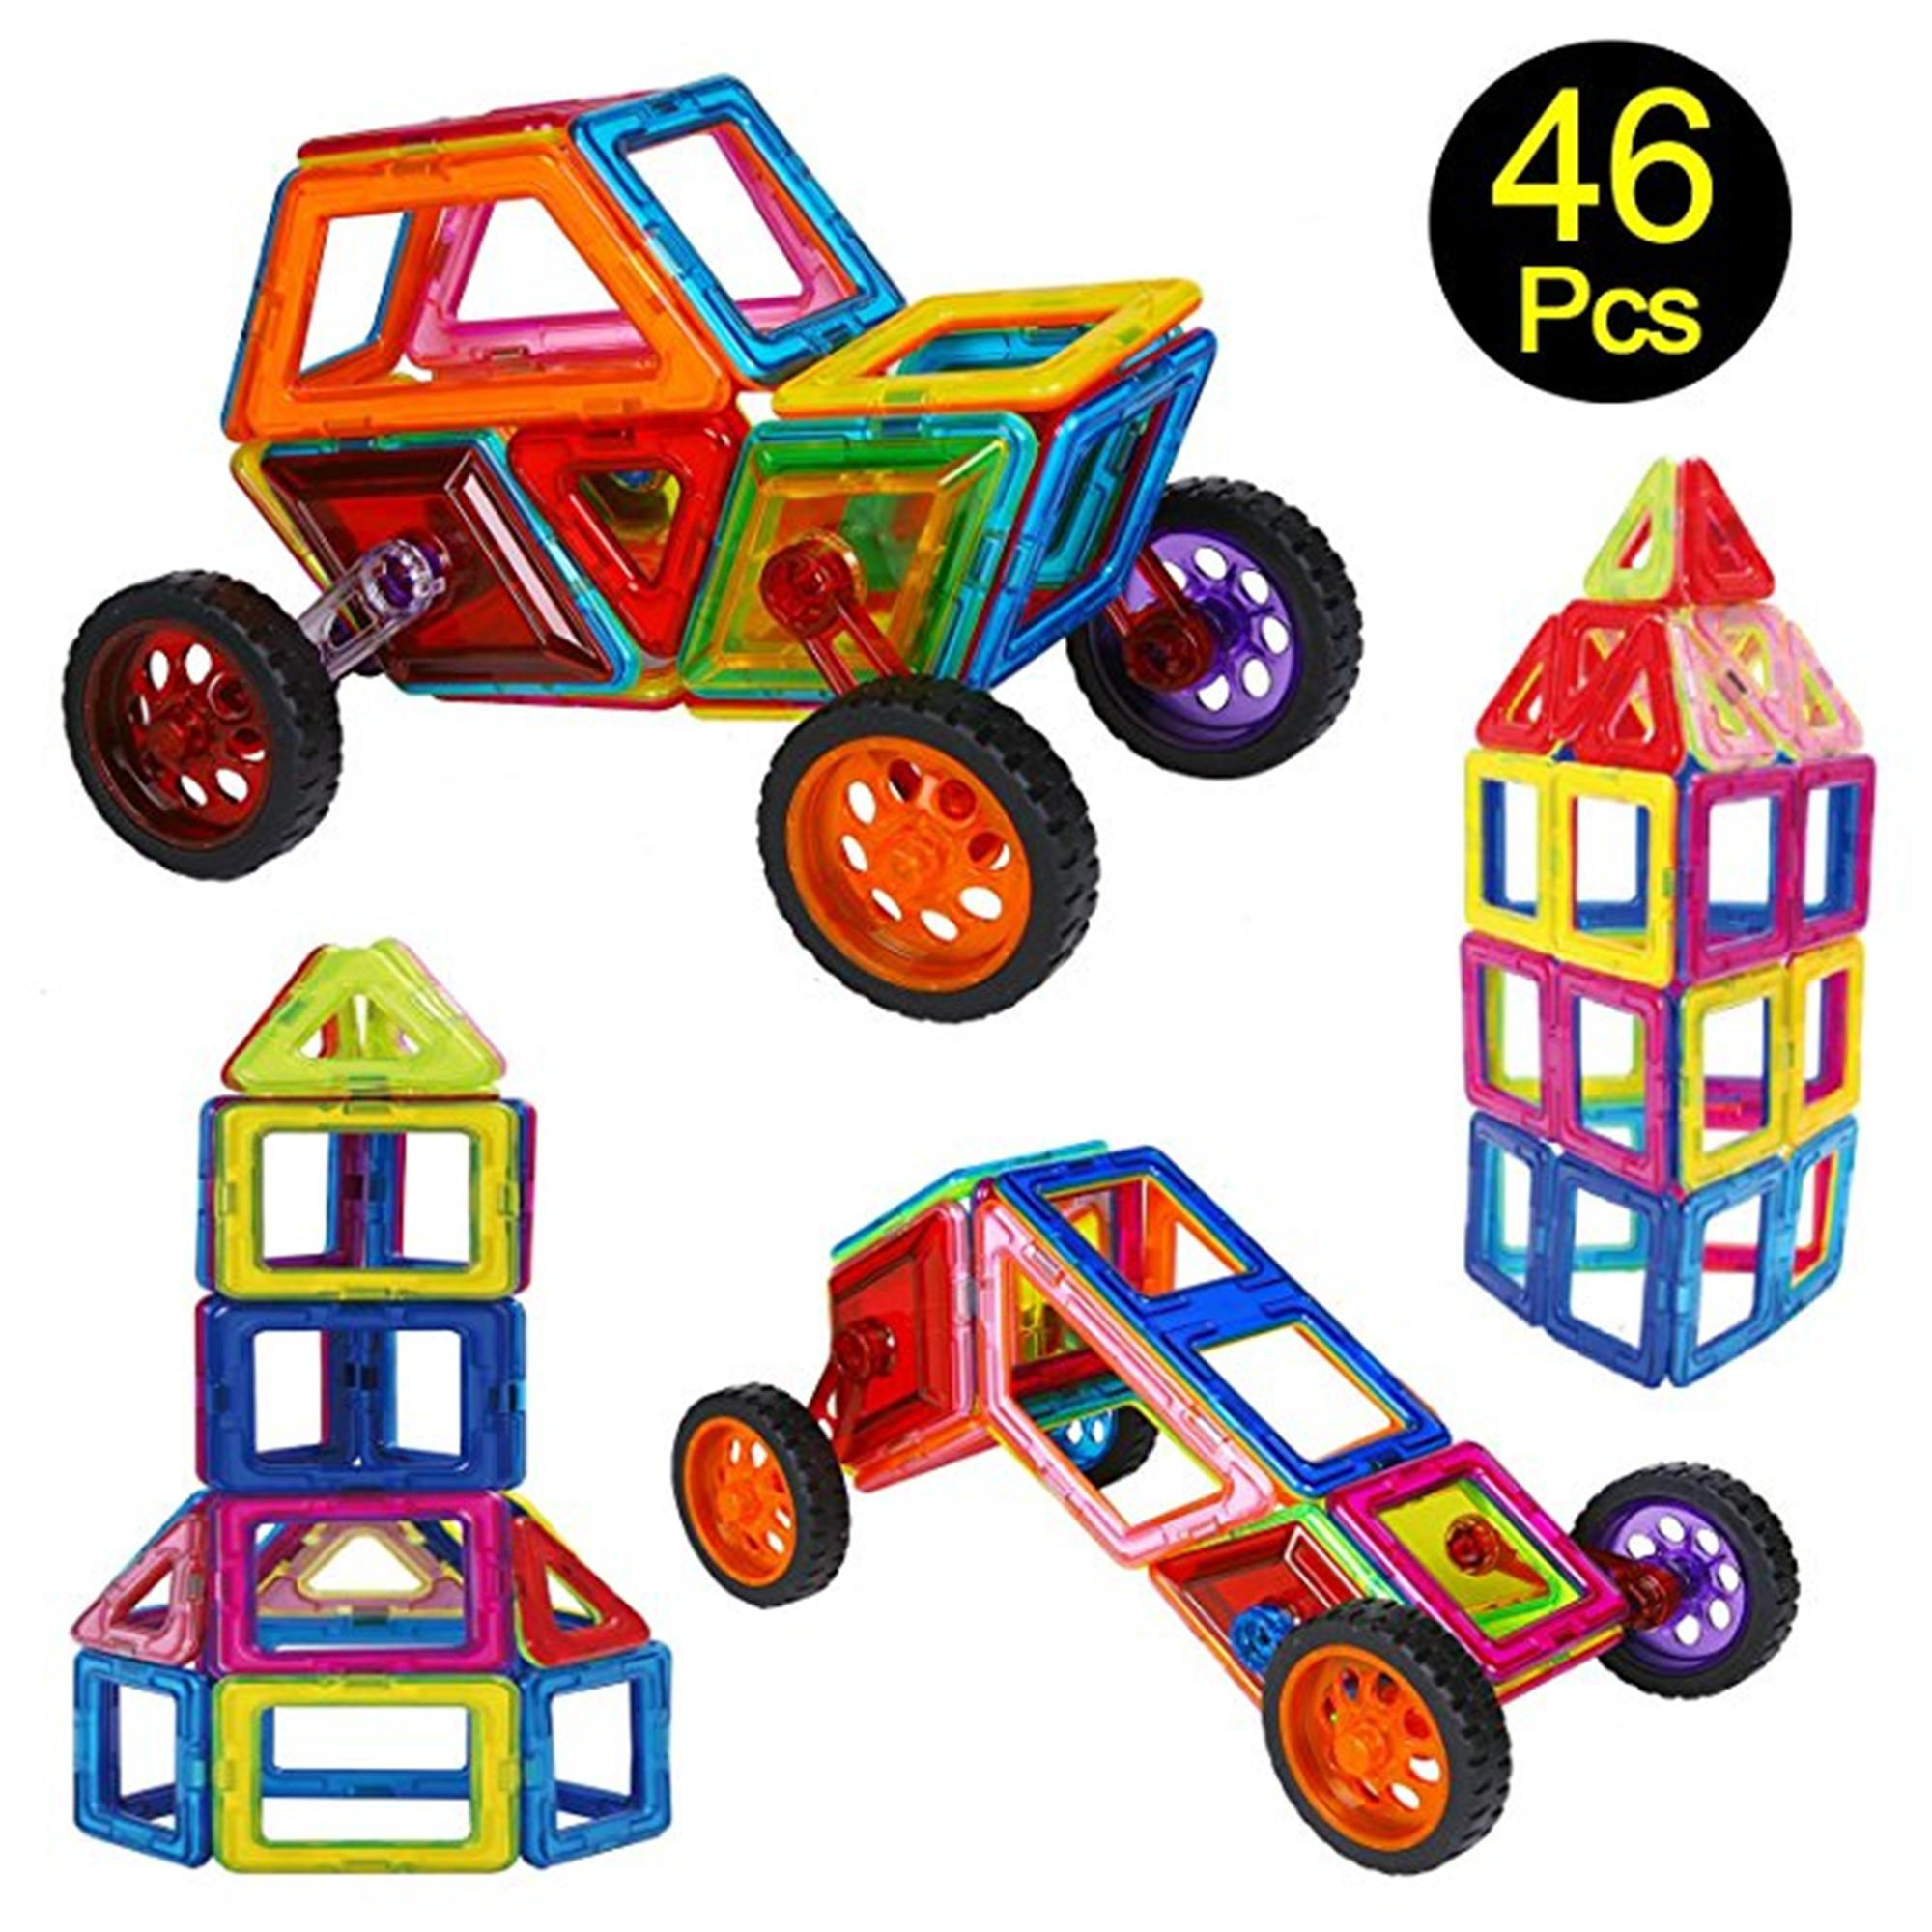 Blok Bangunan Magnetik Shimfun 46 piece Mainan Magnet Judul Bentuk Konstruksi Meja Mobil Set dengan Tas